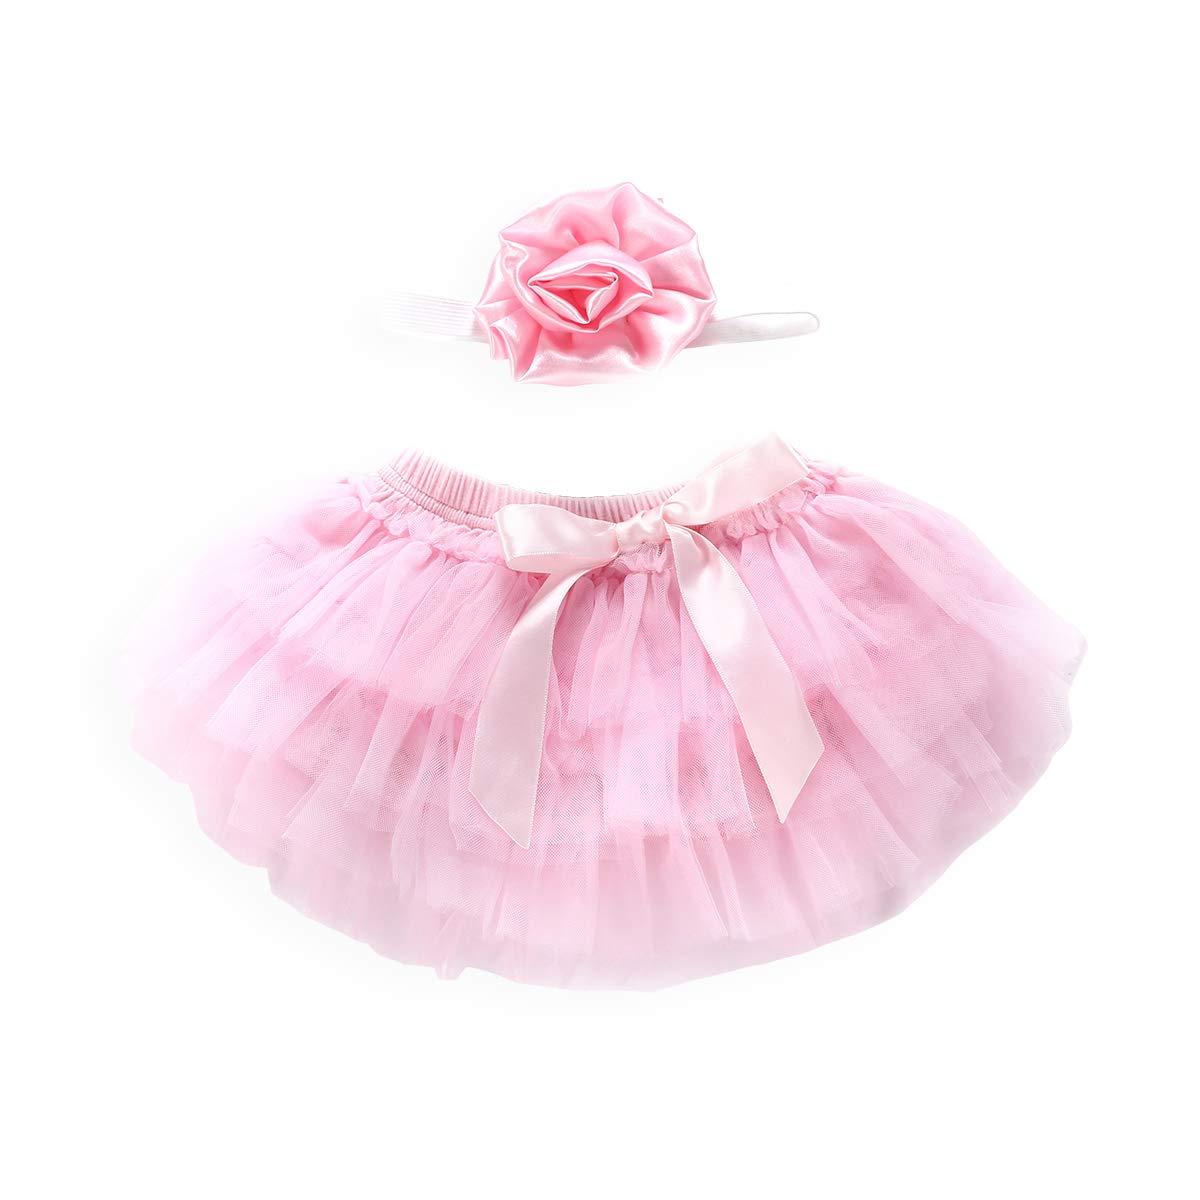 Headband Unmega Baby Girl Tulle Bloomers Tutu Newborn Ruffle Diaper Cover Infant Bowknot Skirt